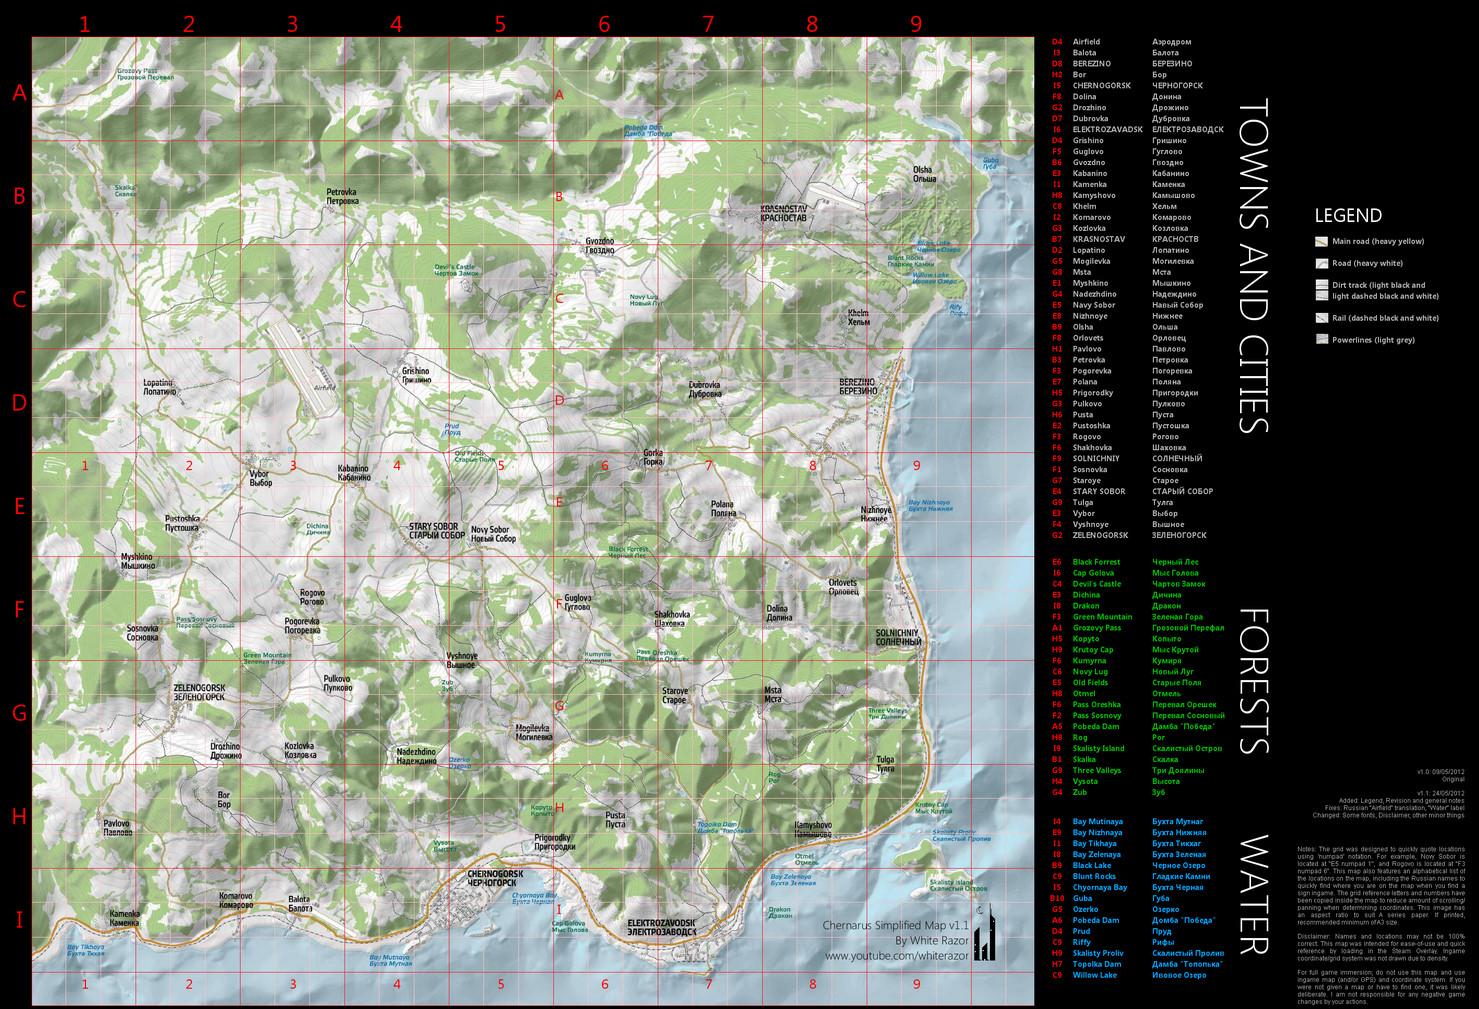 ... orcz.com/index.php?title=DayZ_Standalone:_Chernarus_Map